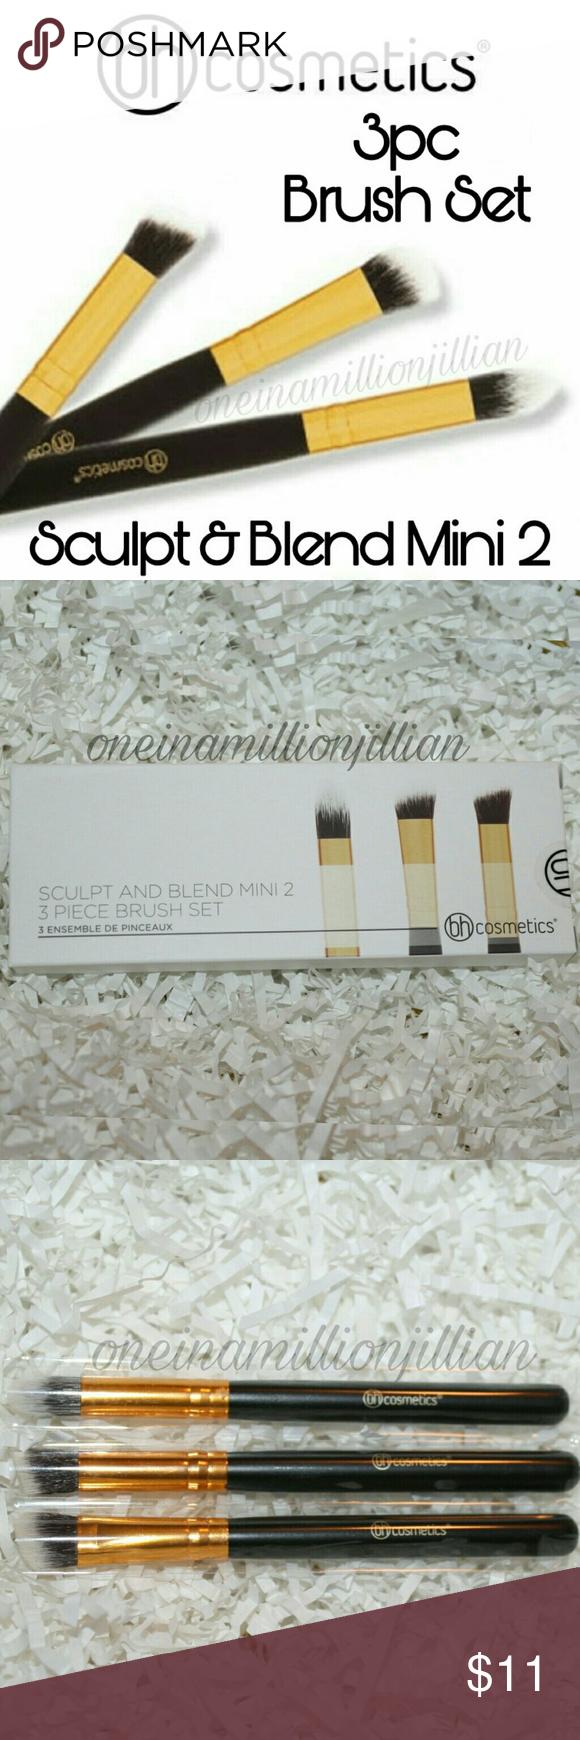 c168f1340253 BH Cosmetics Sculpt   Blend Mini 2 New in Box - Never Used 100% Authentic